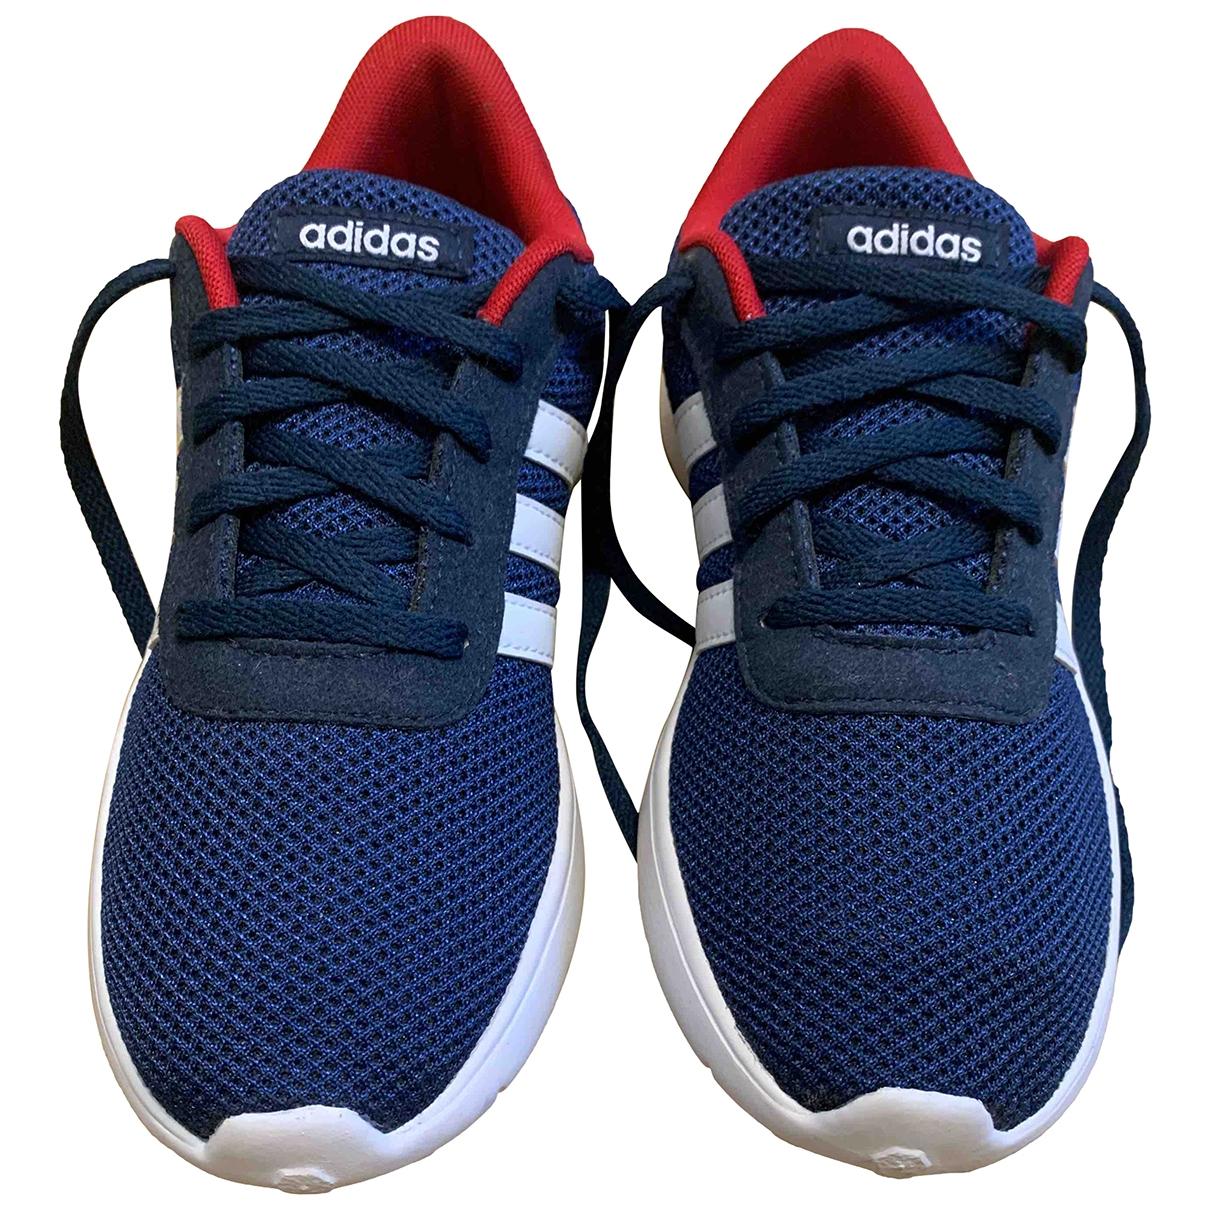 Adidas \N Blue Trainers for Women 36.5 EU